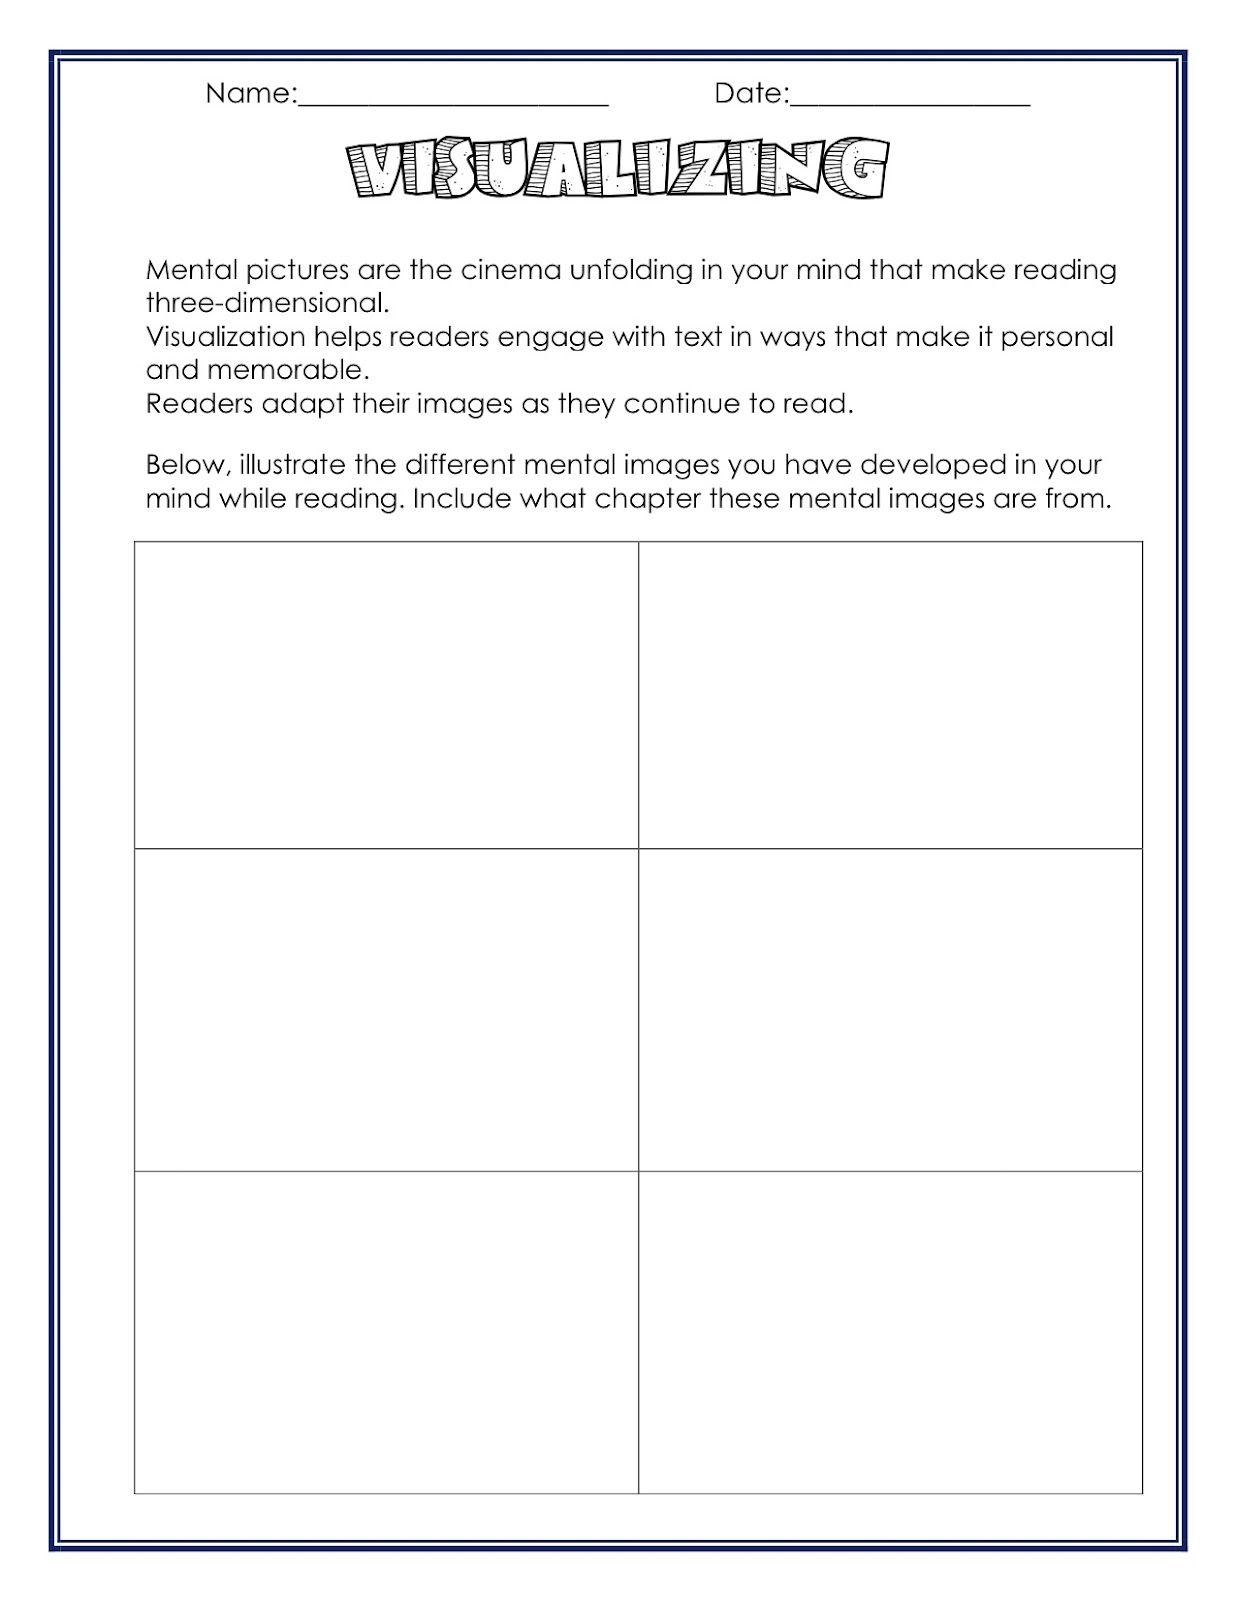 Freeeducationcom/worksheets For Second Grade   Comprehension ...